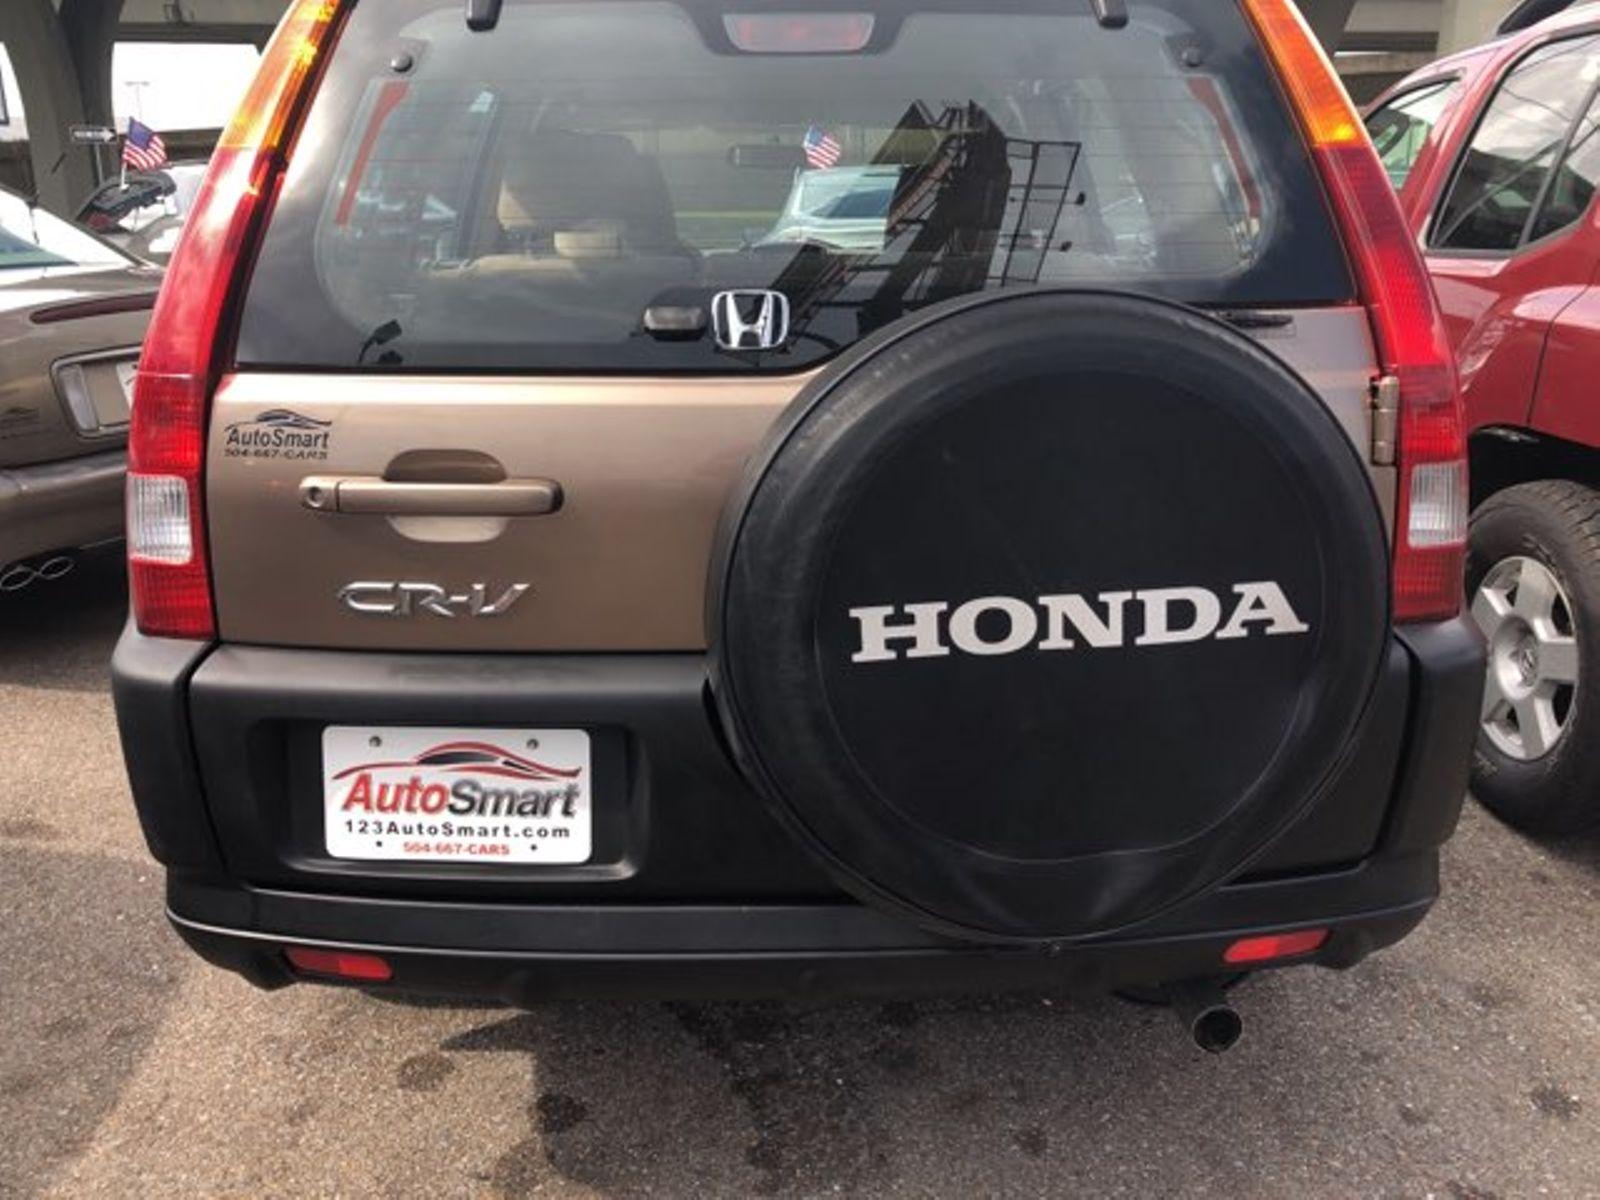 2003 Honda Cr V Lx City La Autosmart In Harvey